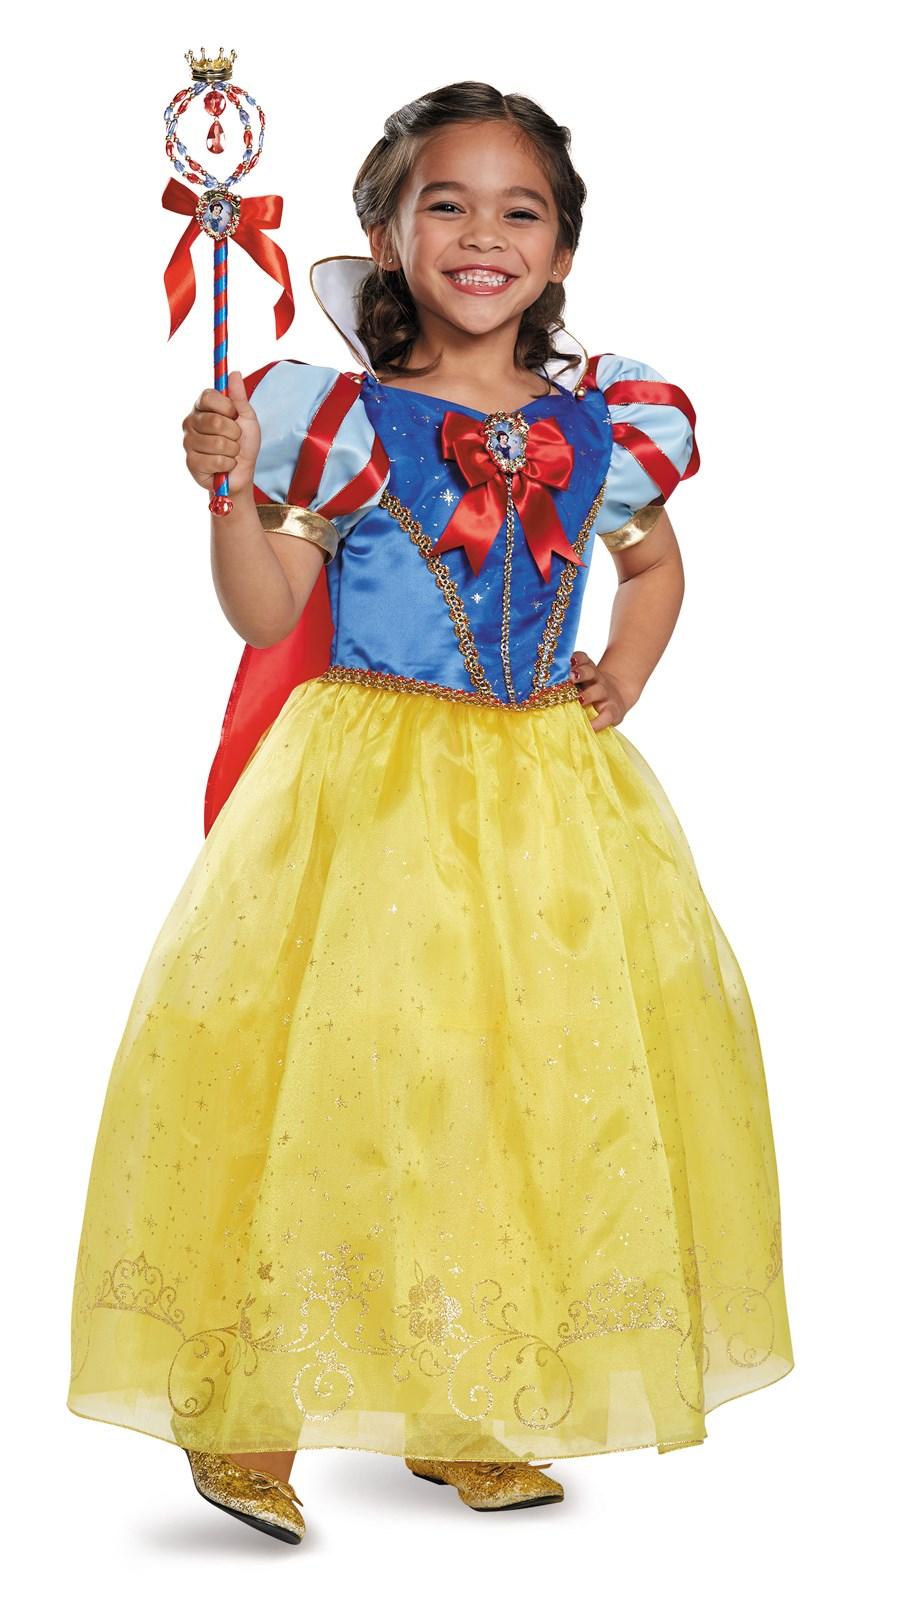 Snow White Halloween Costumes | BuyCostumes.com